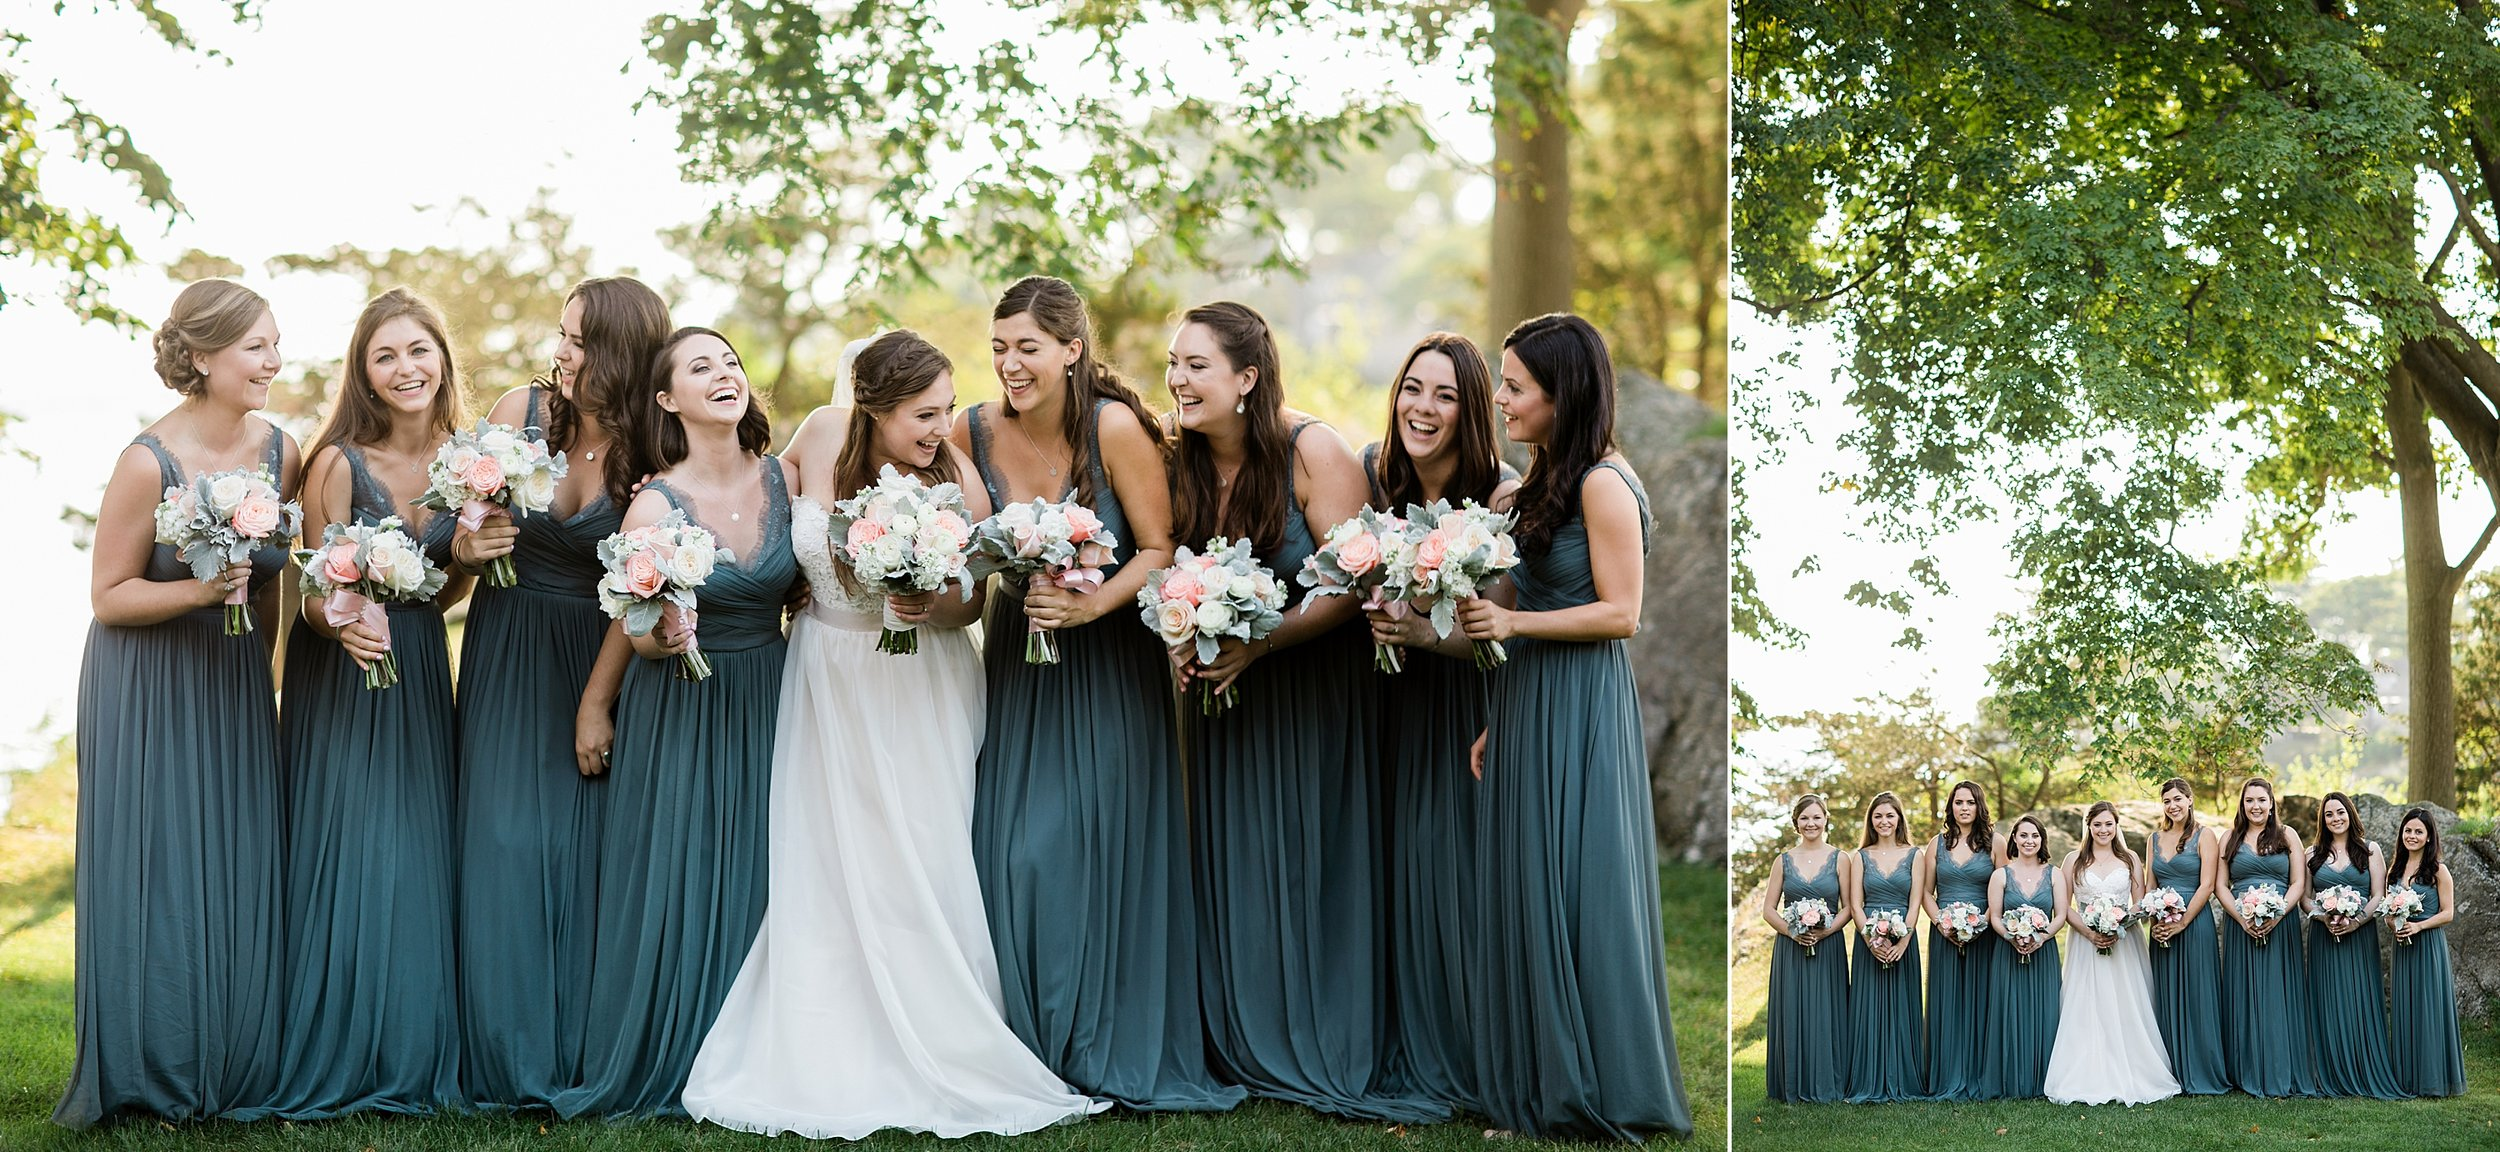 019 los angeles wedding photographer todd danforth photography boston.jpg